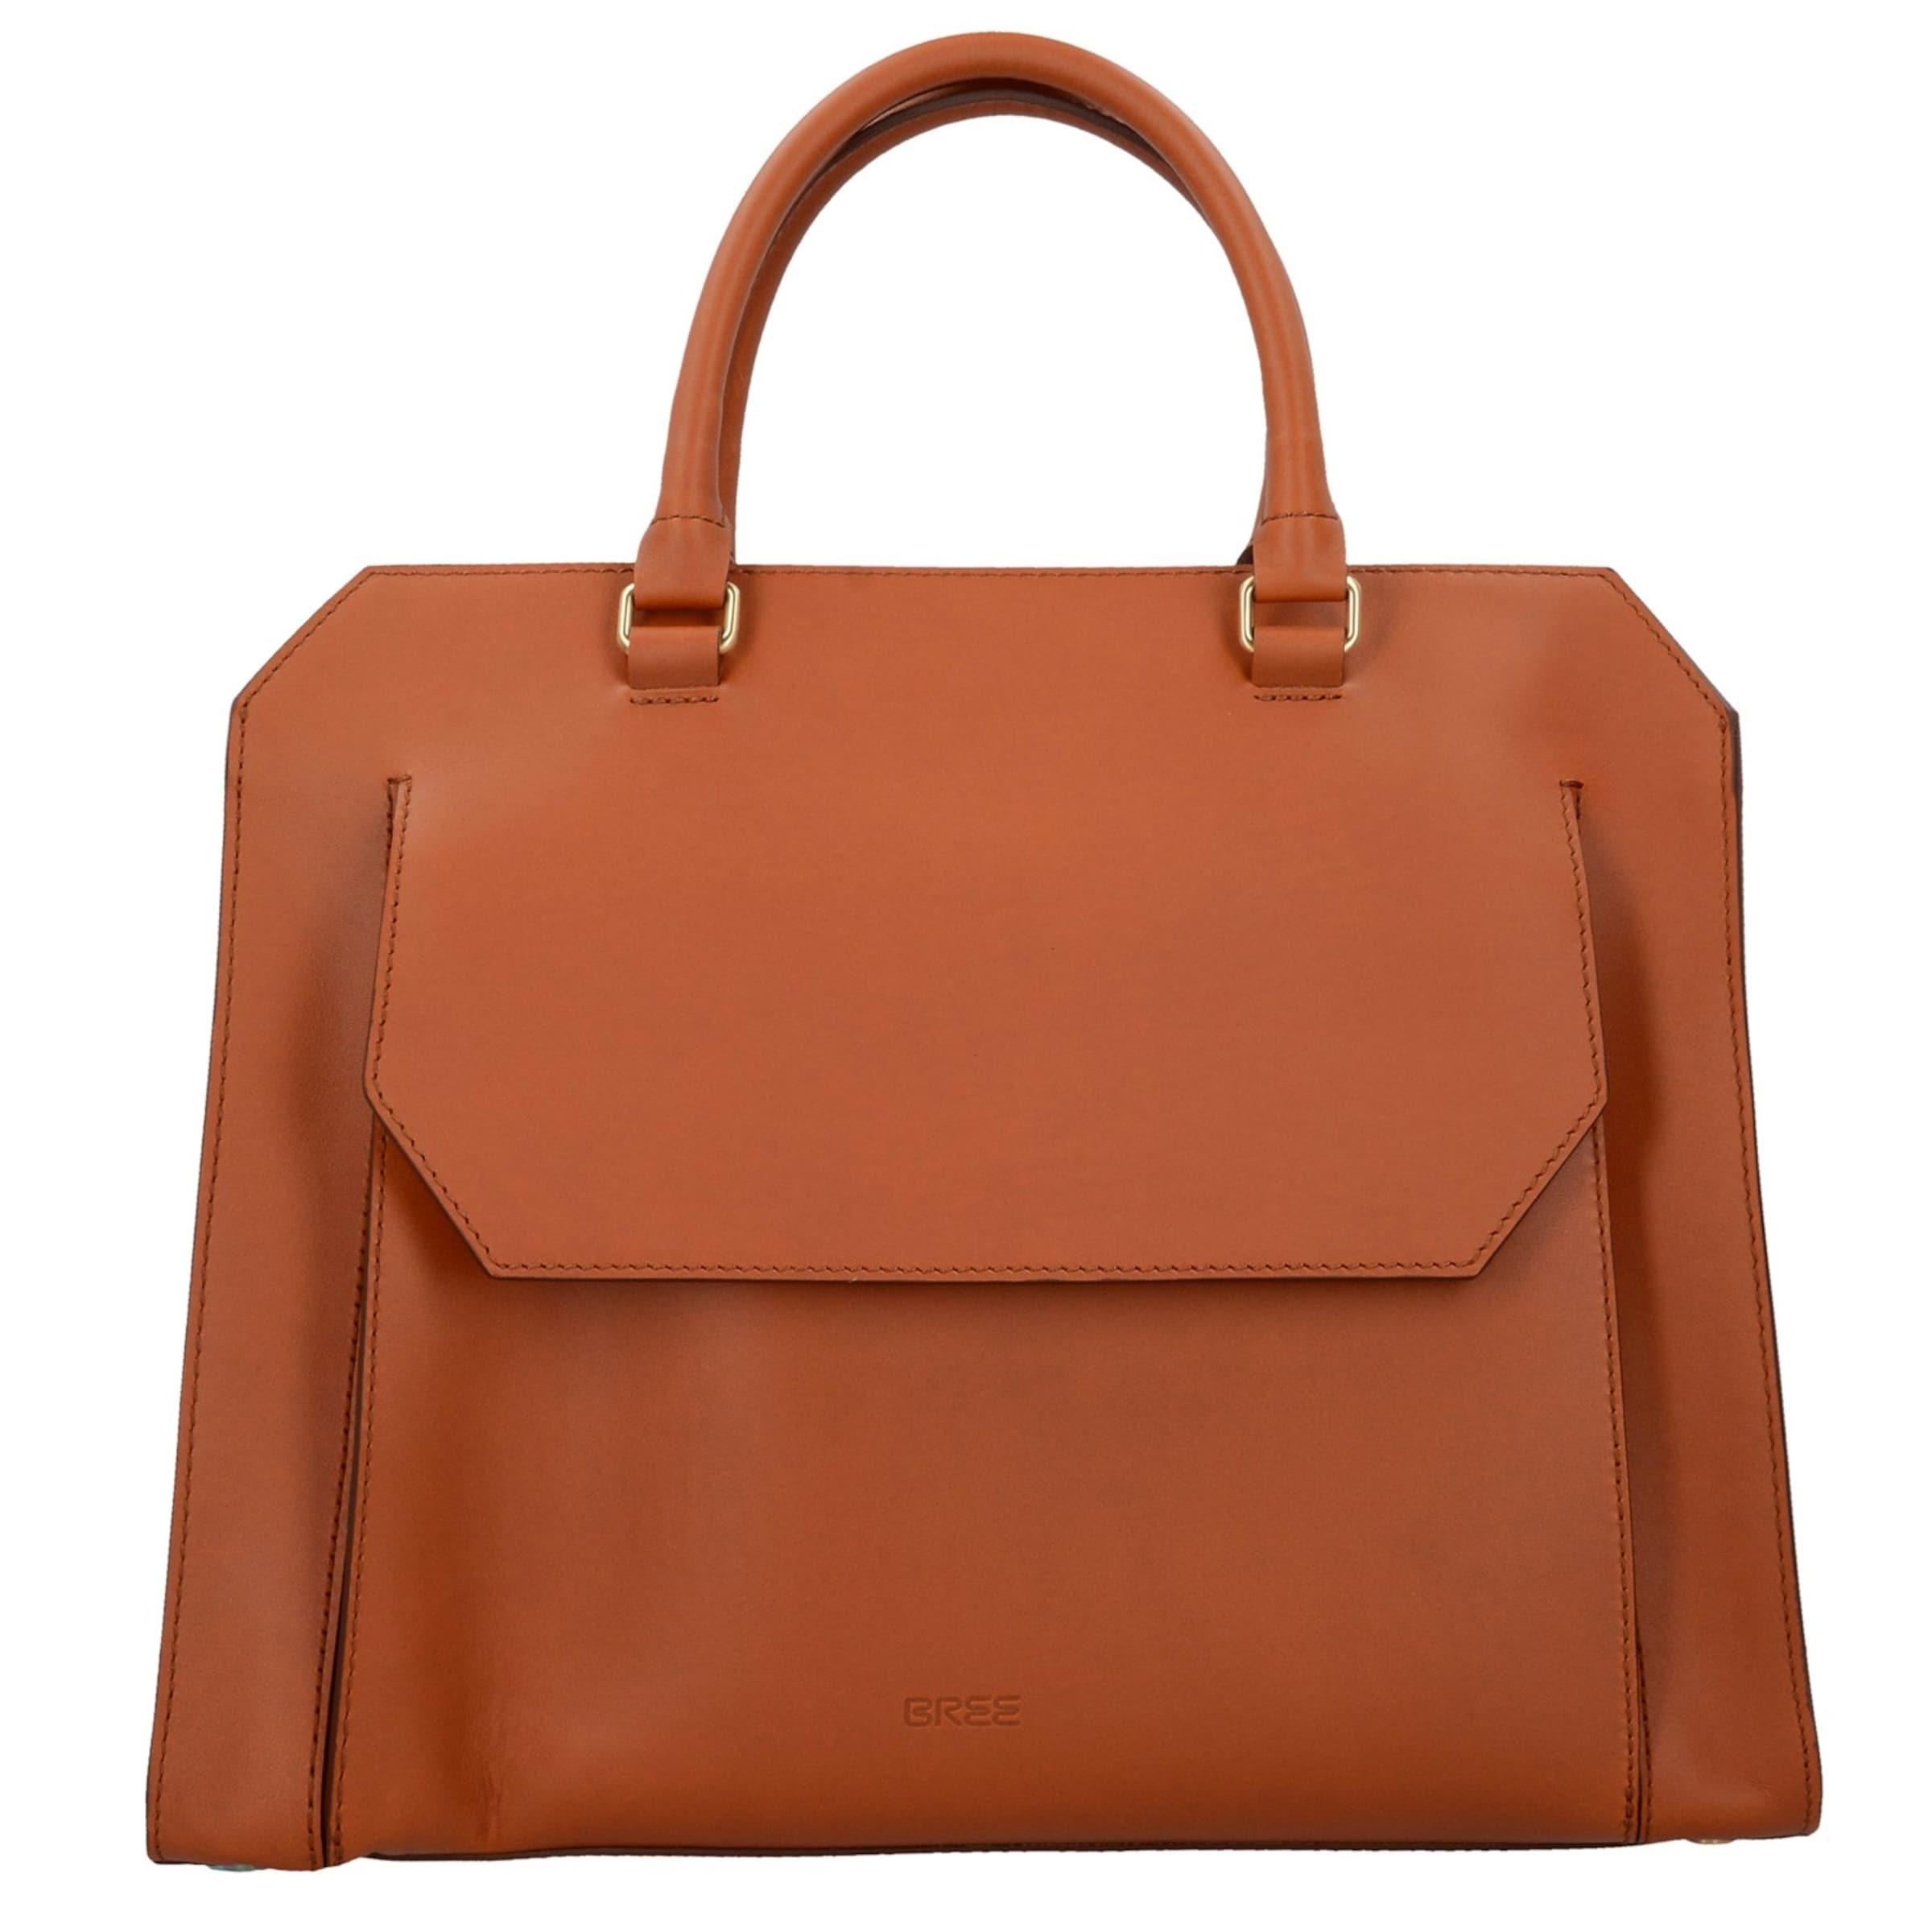 BREE 'Cambridge 13' Handtasche 35 cm Leder